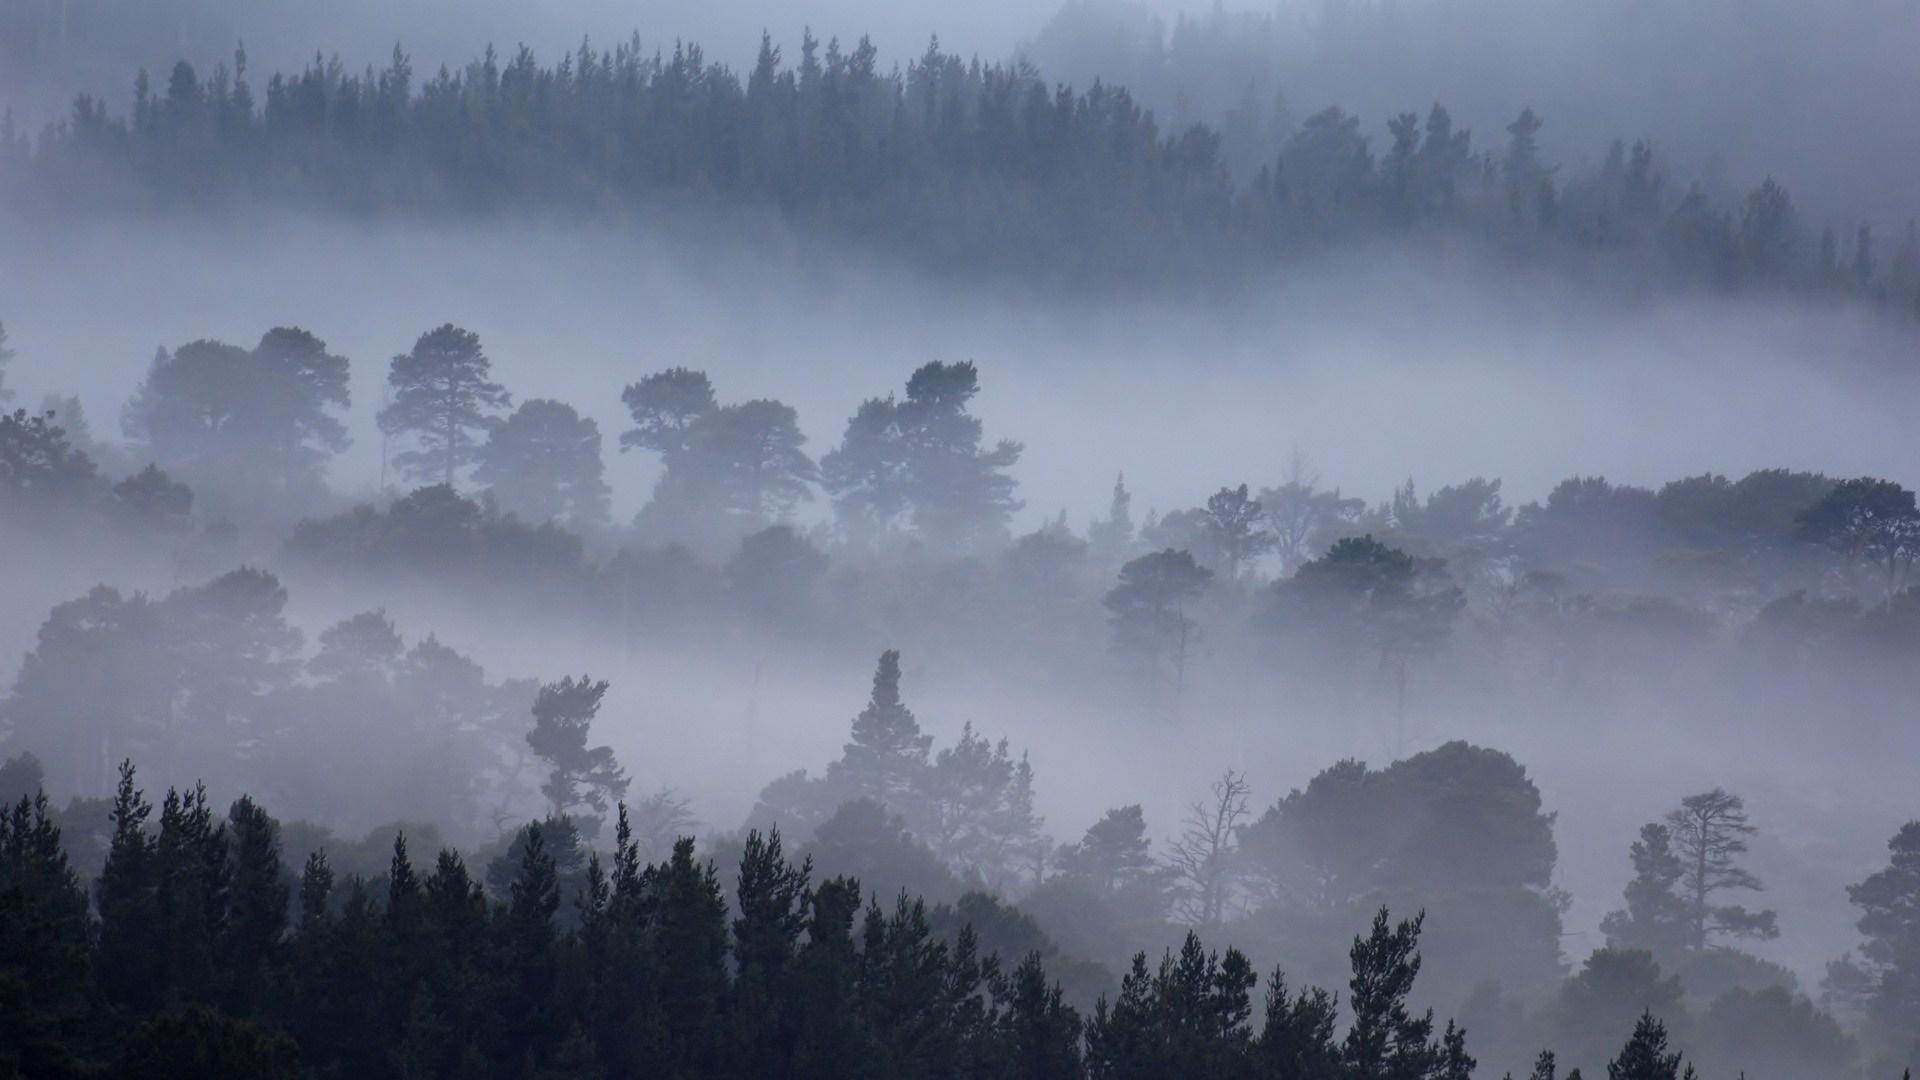 Foggy Fall Wallpaper Nature Mountain Forest Fog Tree Landscape Hd Wallpaper